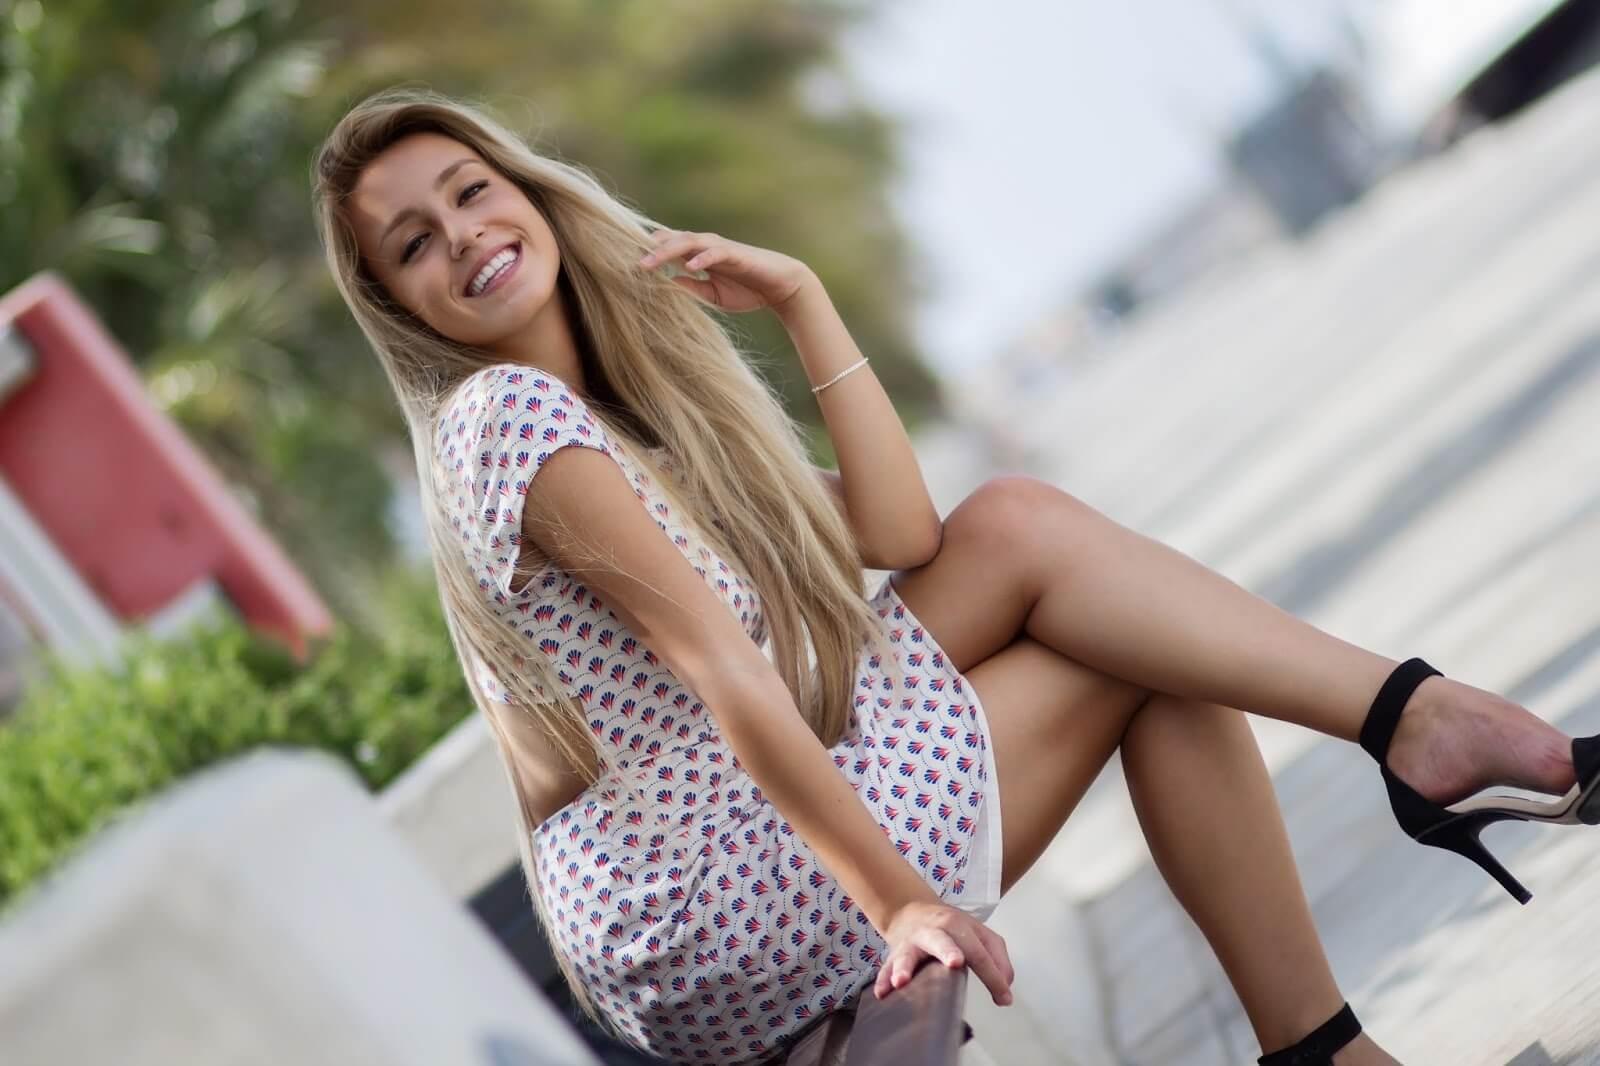 alicantina, preciosa, guapa, bonita, Xandra, Xandra Garsem, sonrisa, sonriendo, sonreir, sonreír, rubia, tacones, vestido, elegante, elegancia, espléndida, esplendida